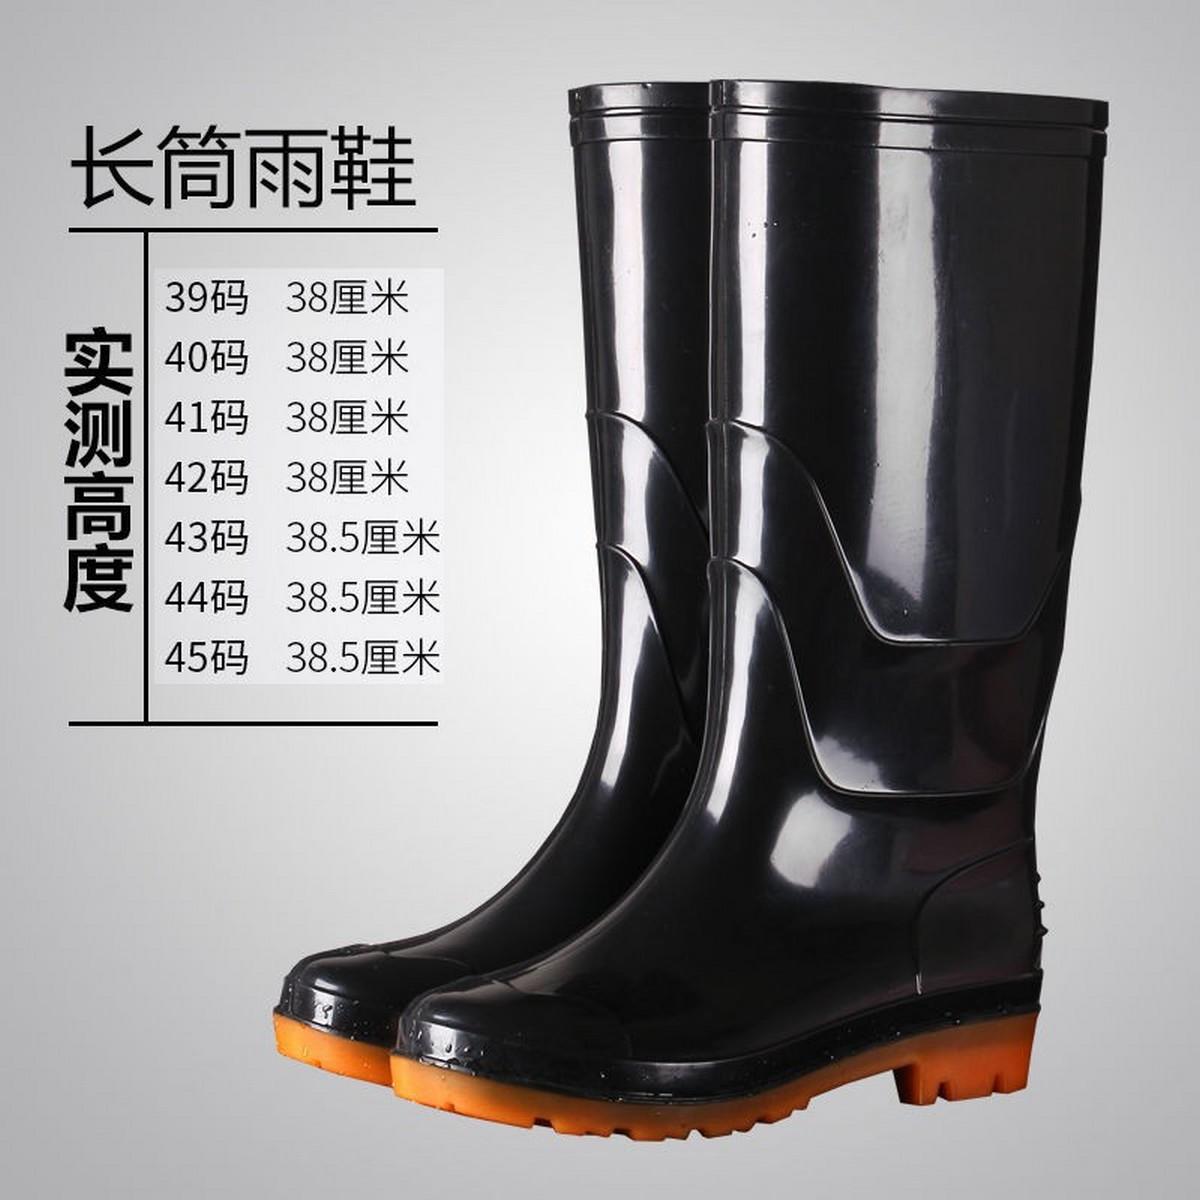 LONG RUBBER RAIN BOOT SHOES MEN &WOMEN - Imported